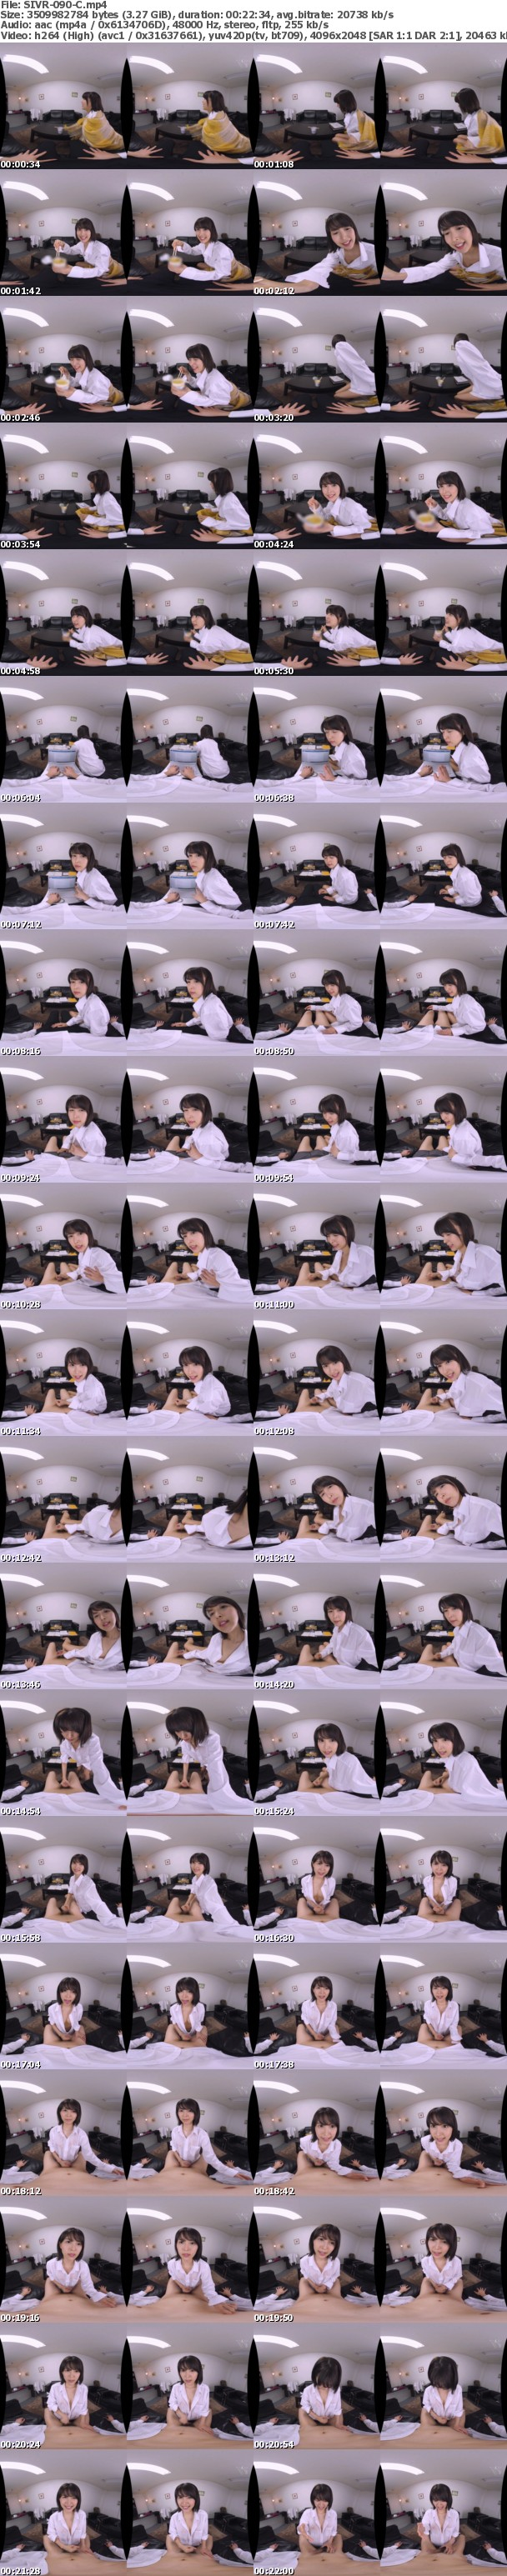 (VR) SIVR-090 暴風雨で憧れの女上司と二人きり。僕たちはオフィスで狂ったようにSEXしまくった… 葵つかさ